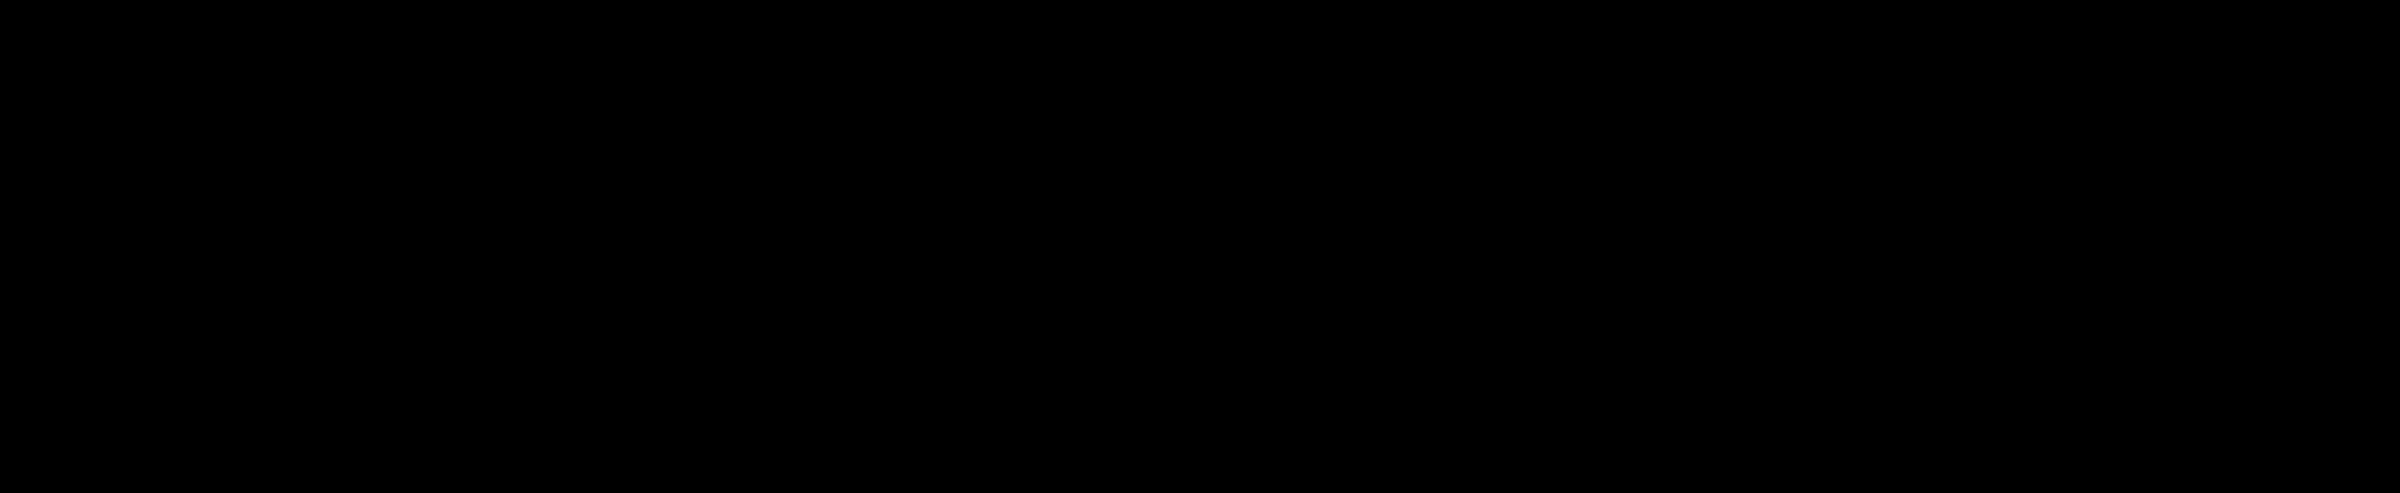 2400x493 Image Of City Skyline Clipart